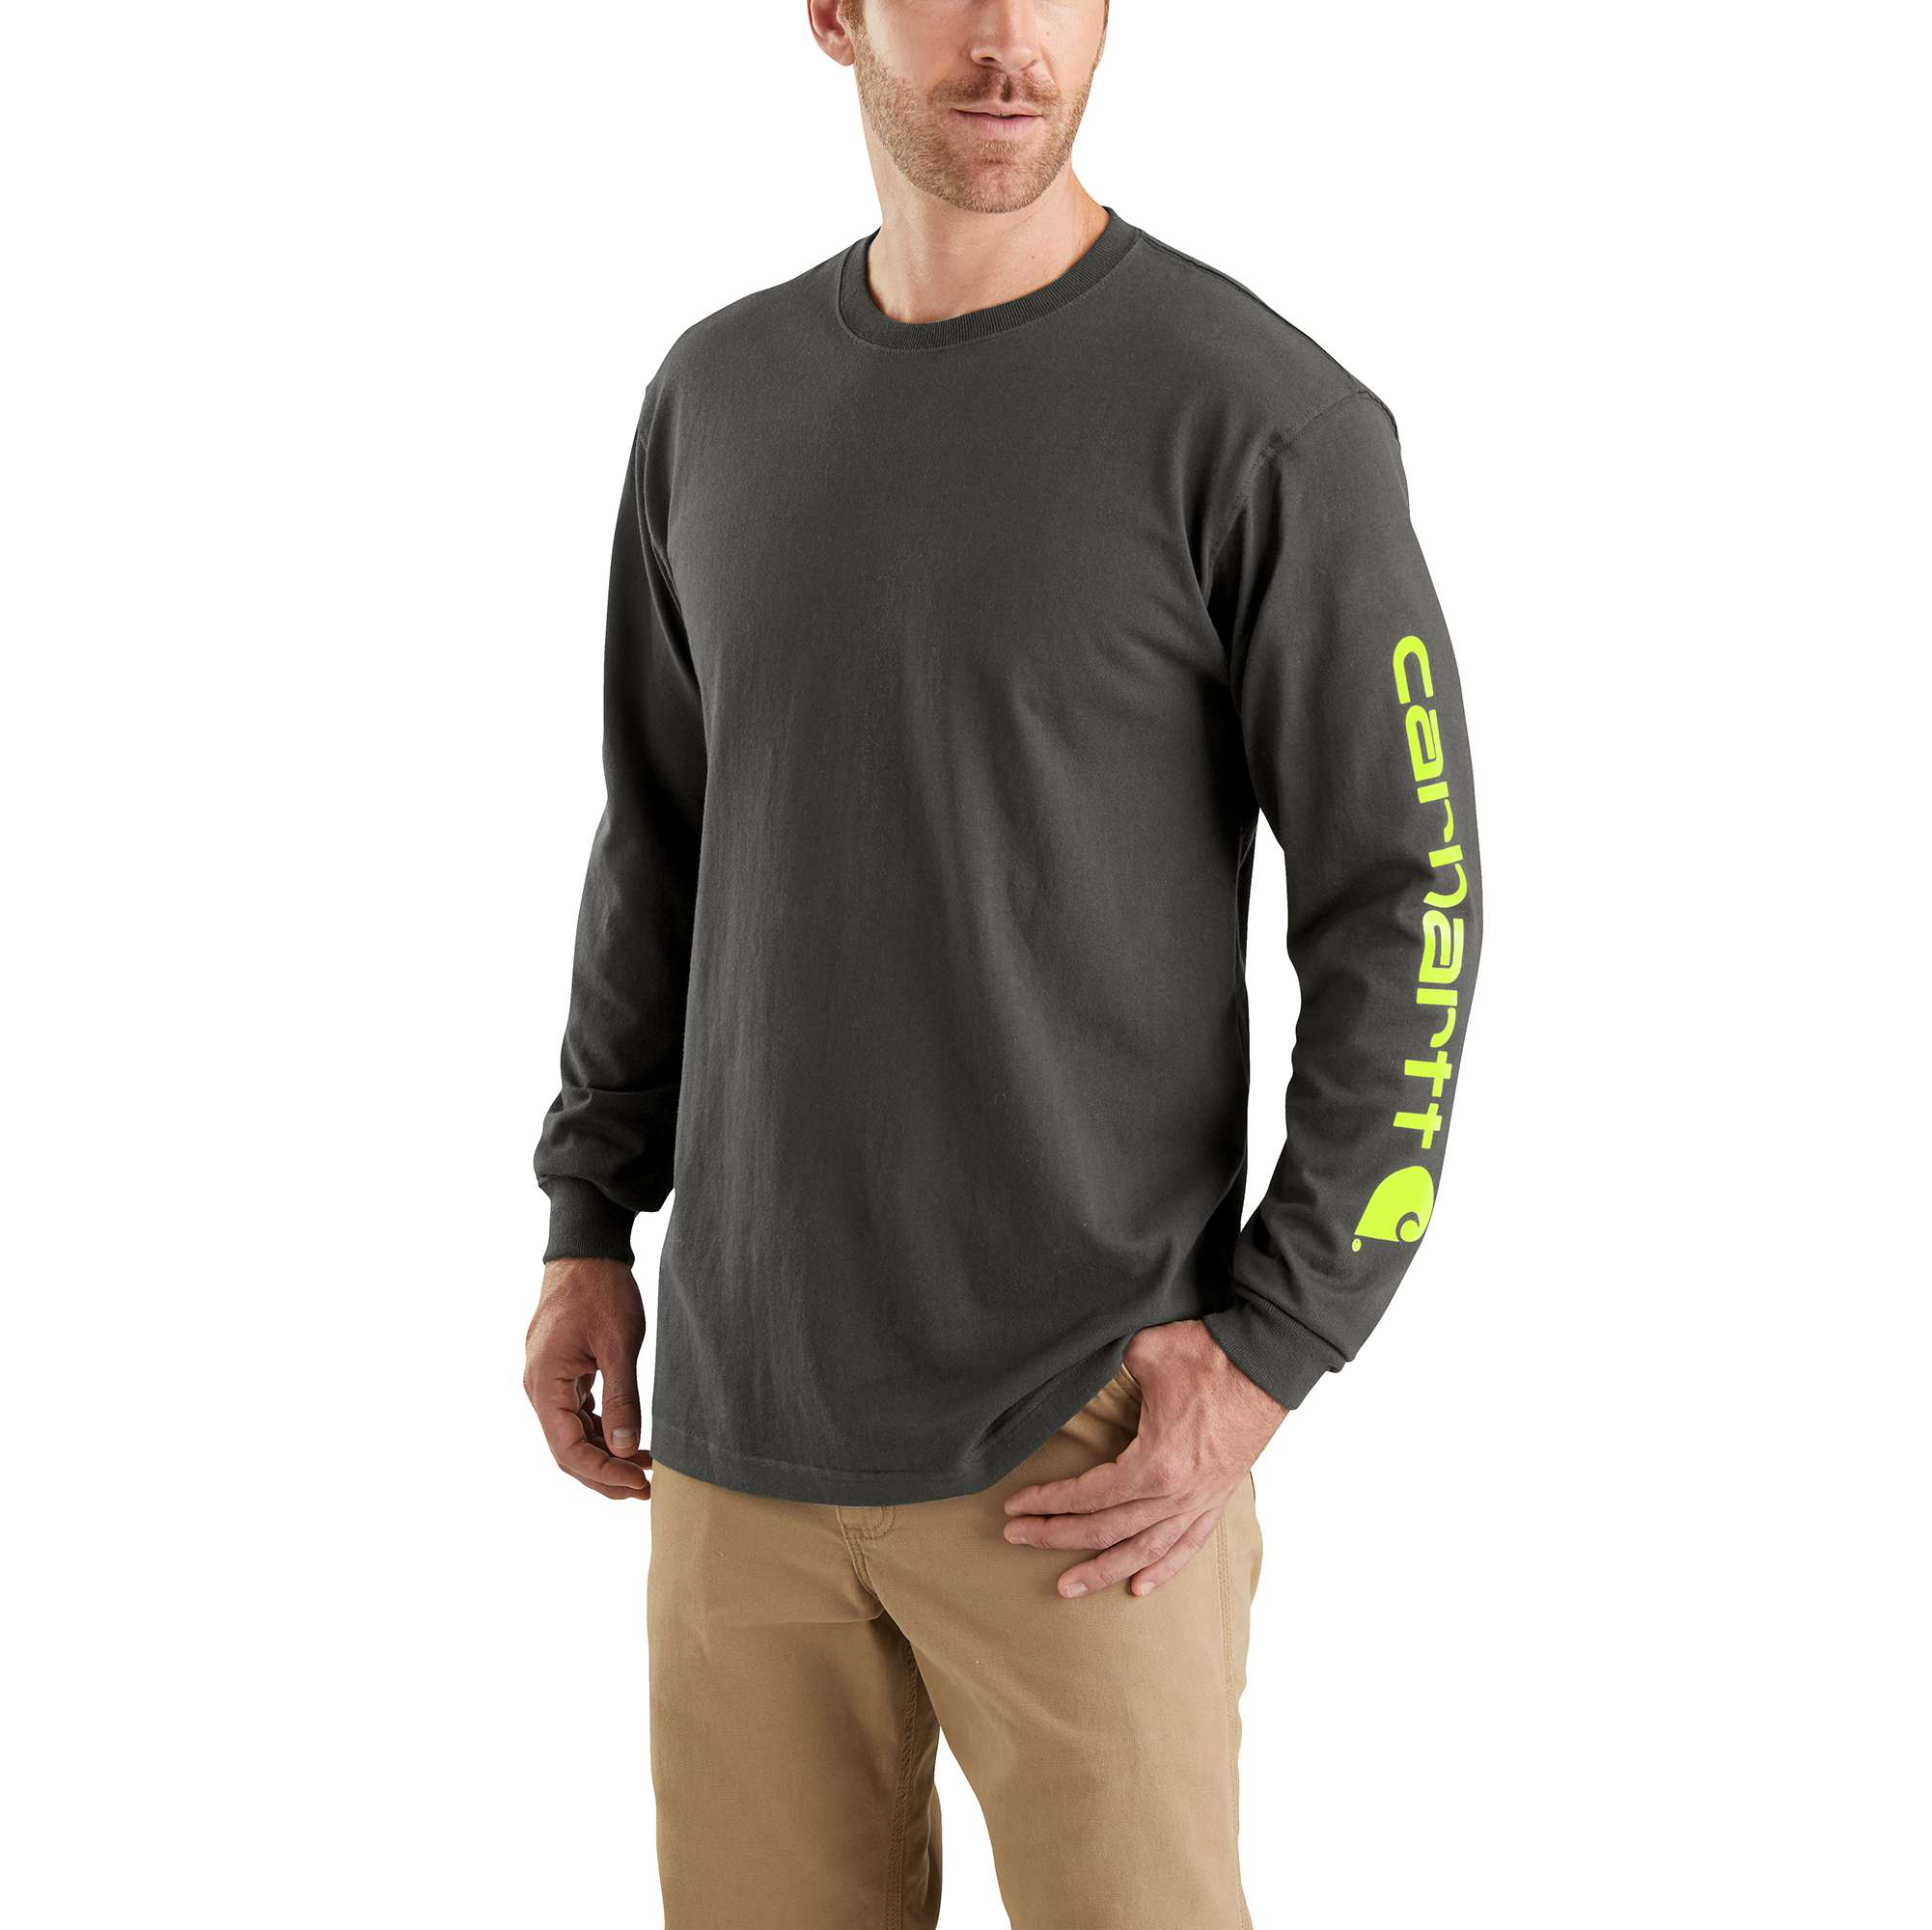 Men's Workwear Long-Sleeve Graphic Logo T-Shirt, Brown, swatch